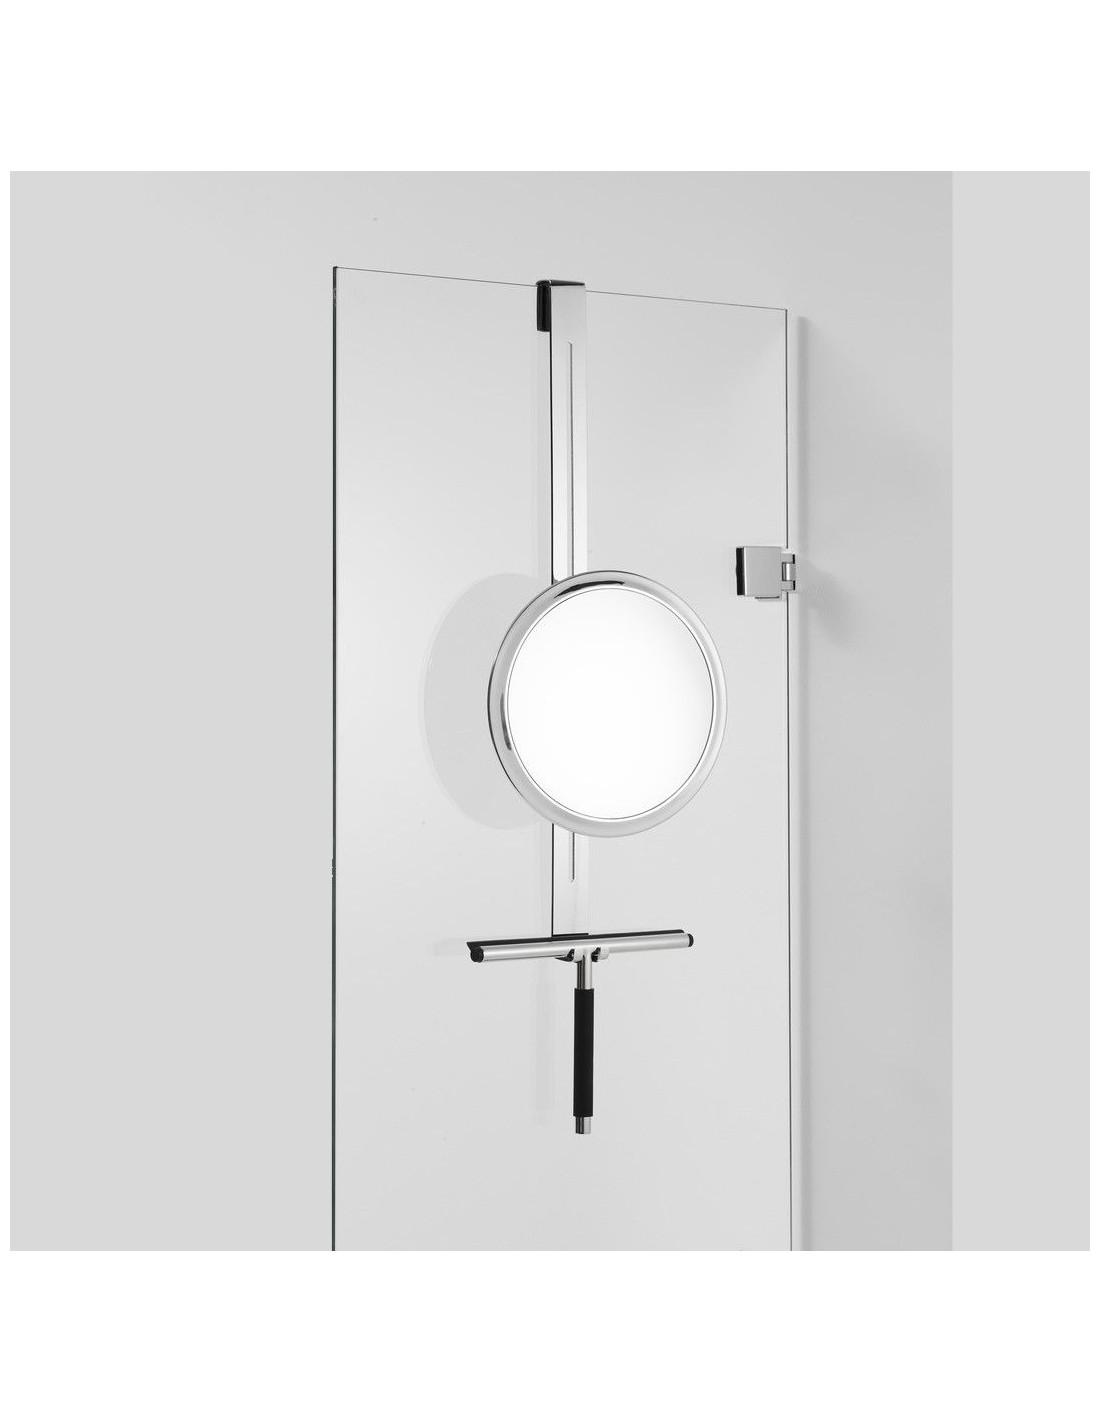 Miroir grossissant Hang Up chromé Decor Walther Valente Design